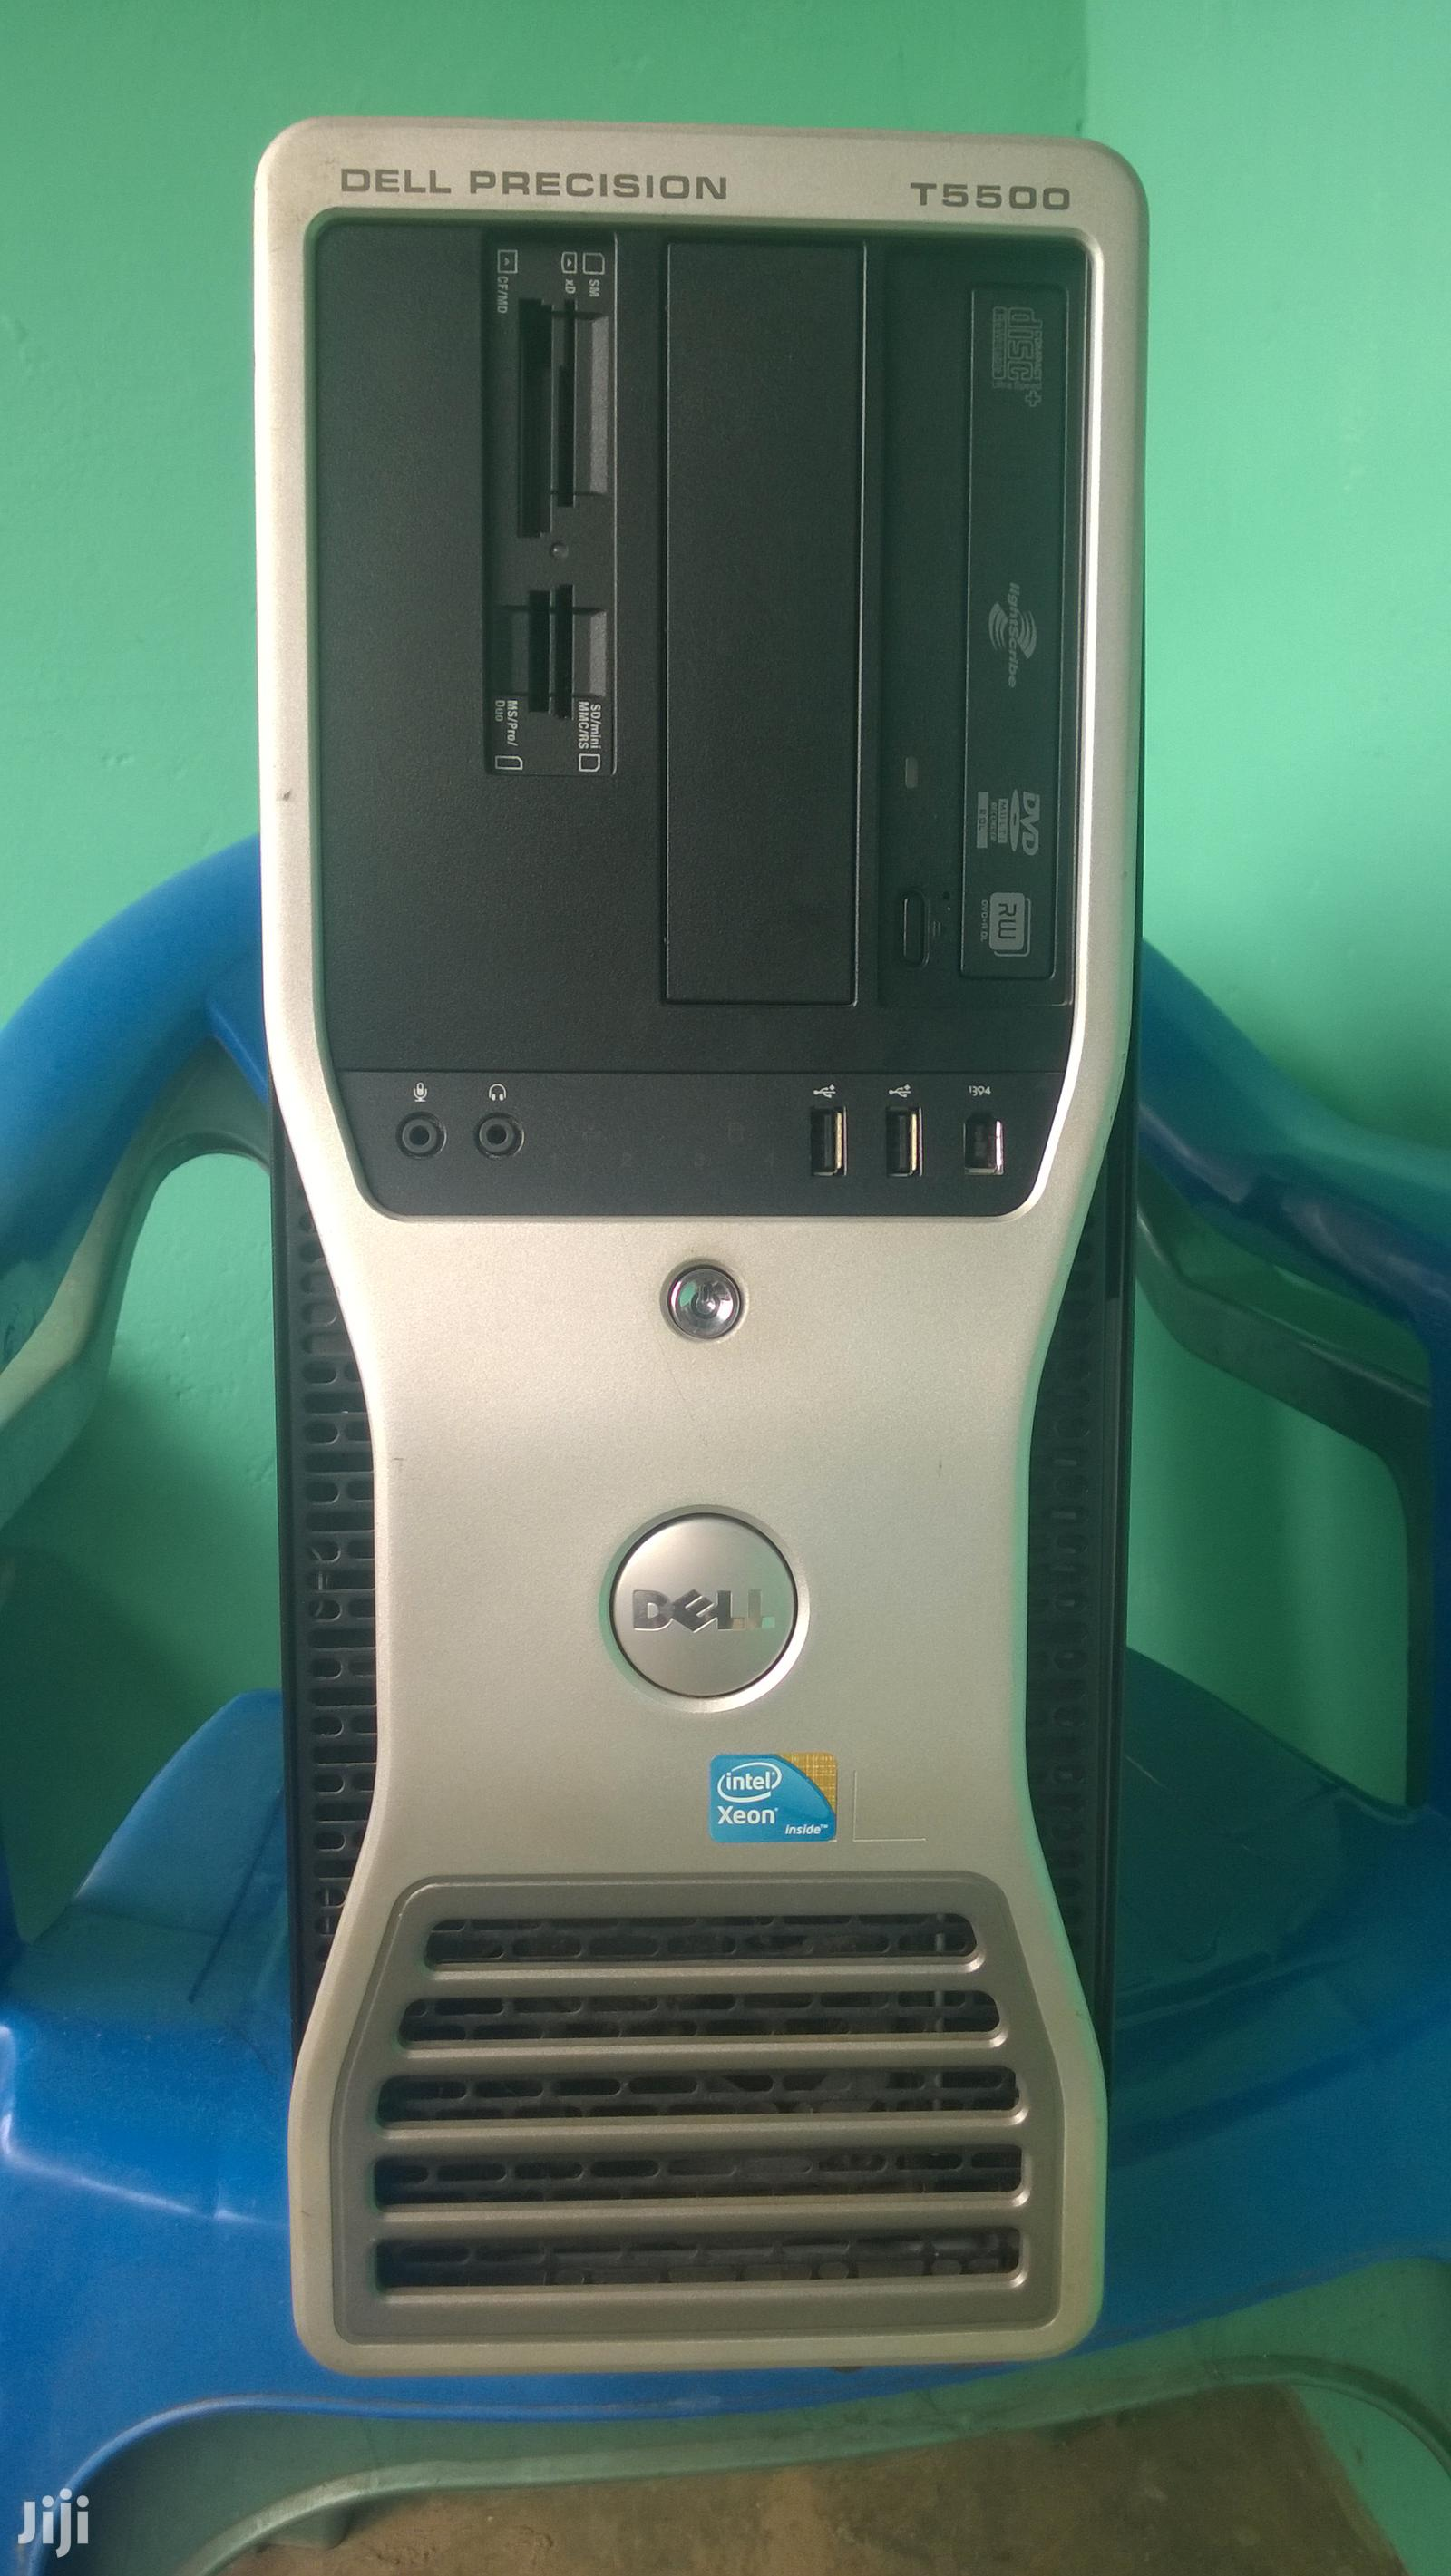 Server Dell PowerEdge T440 16GB Intel Xeon HDD 500GB | Laptops & Computers for sale in Birim South, Eastern Region, Ghana